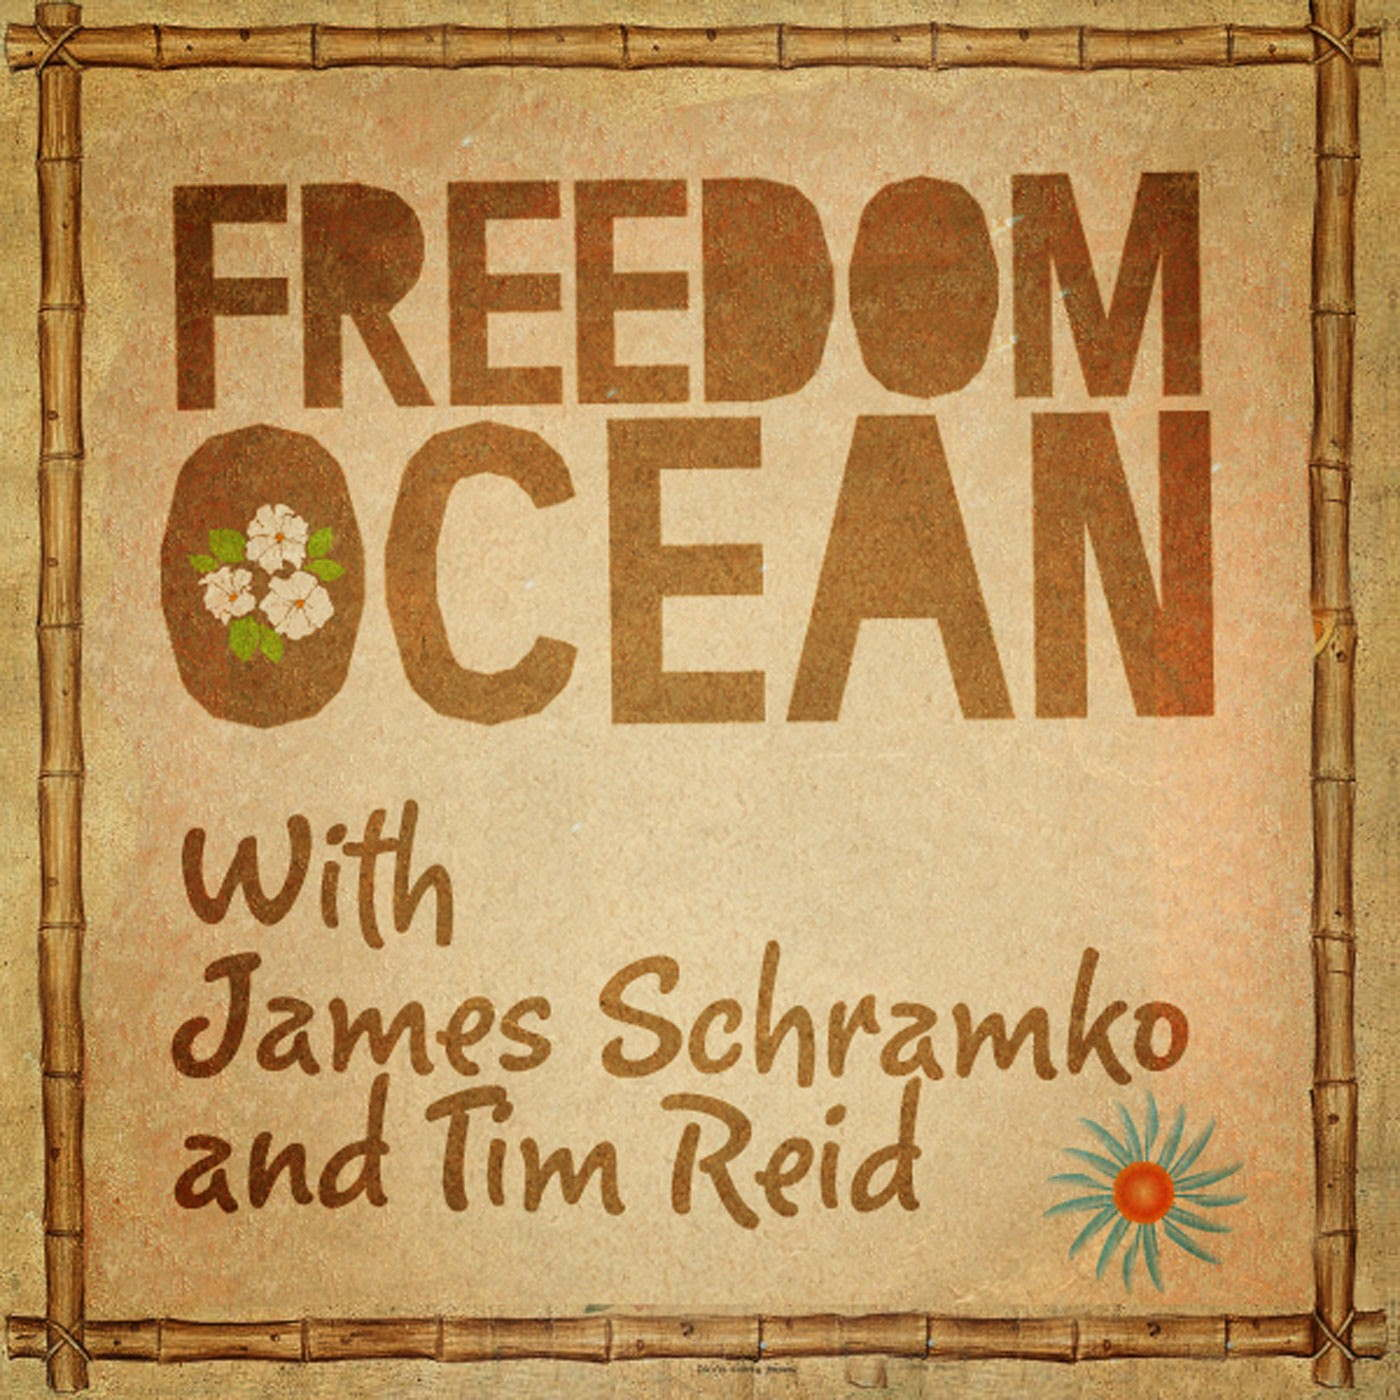 Freedom Ocean Internet Marketing with James Schramko and Tim Reid | Internet Business | Online Marketing Podcast